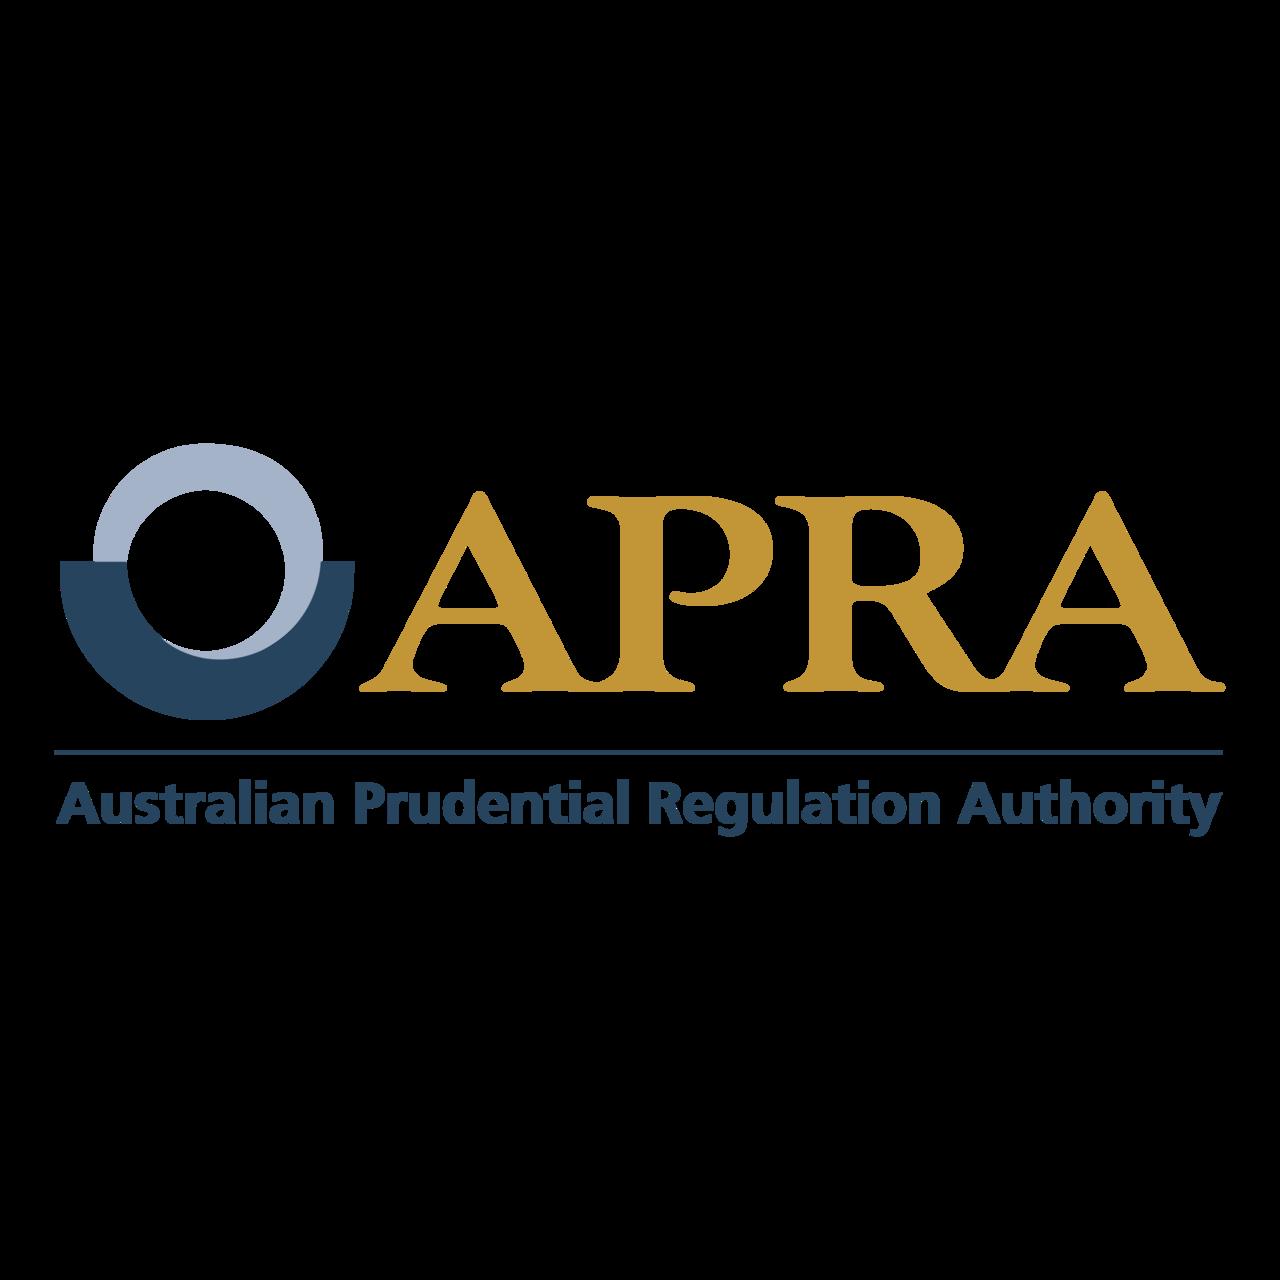 APRA (Australian Prudential Regulation Authority)